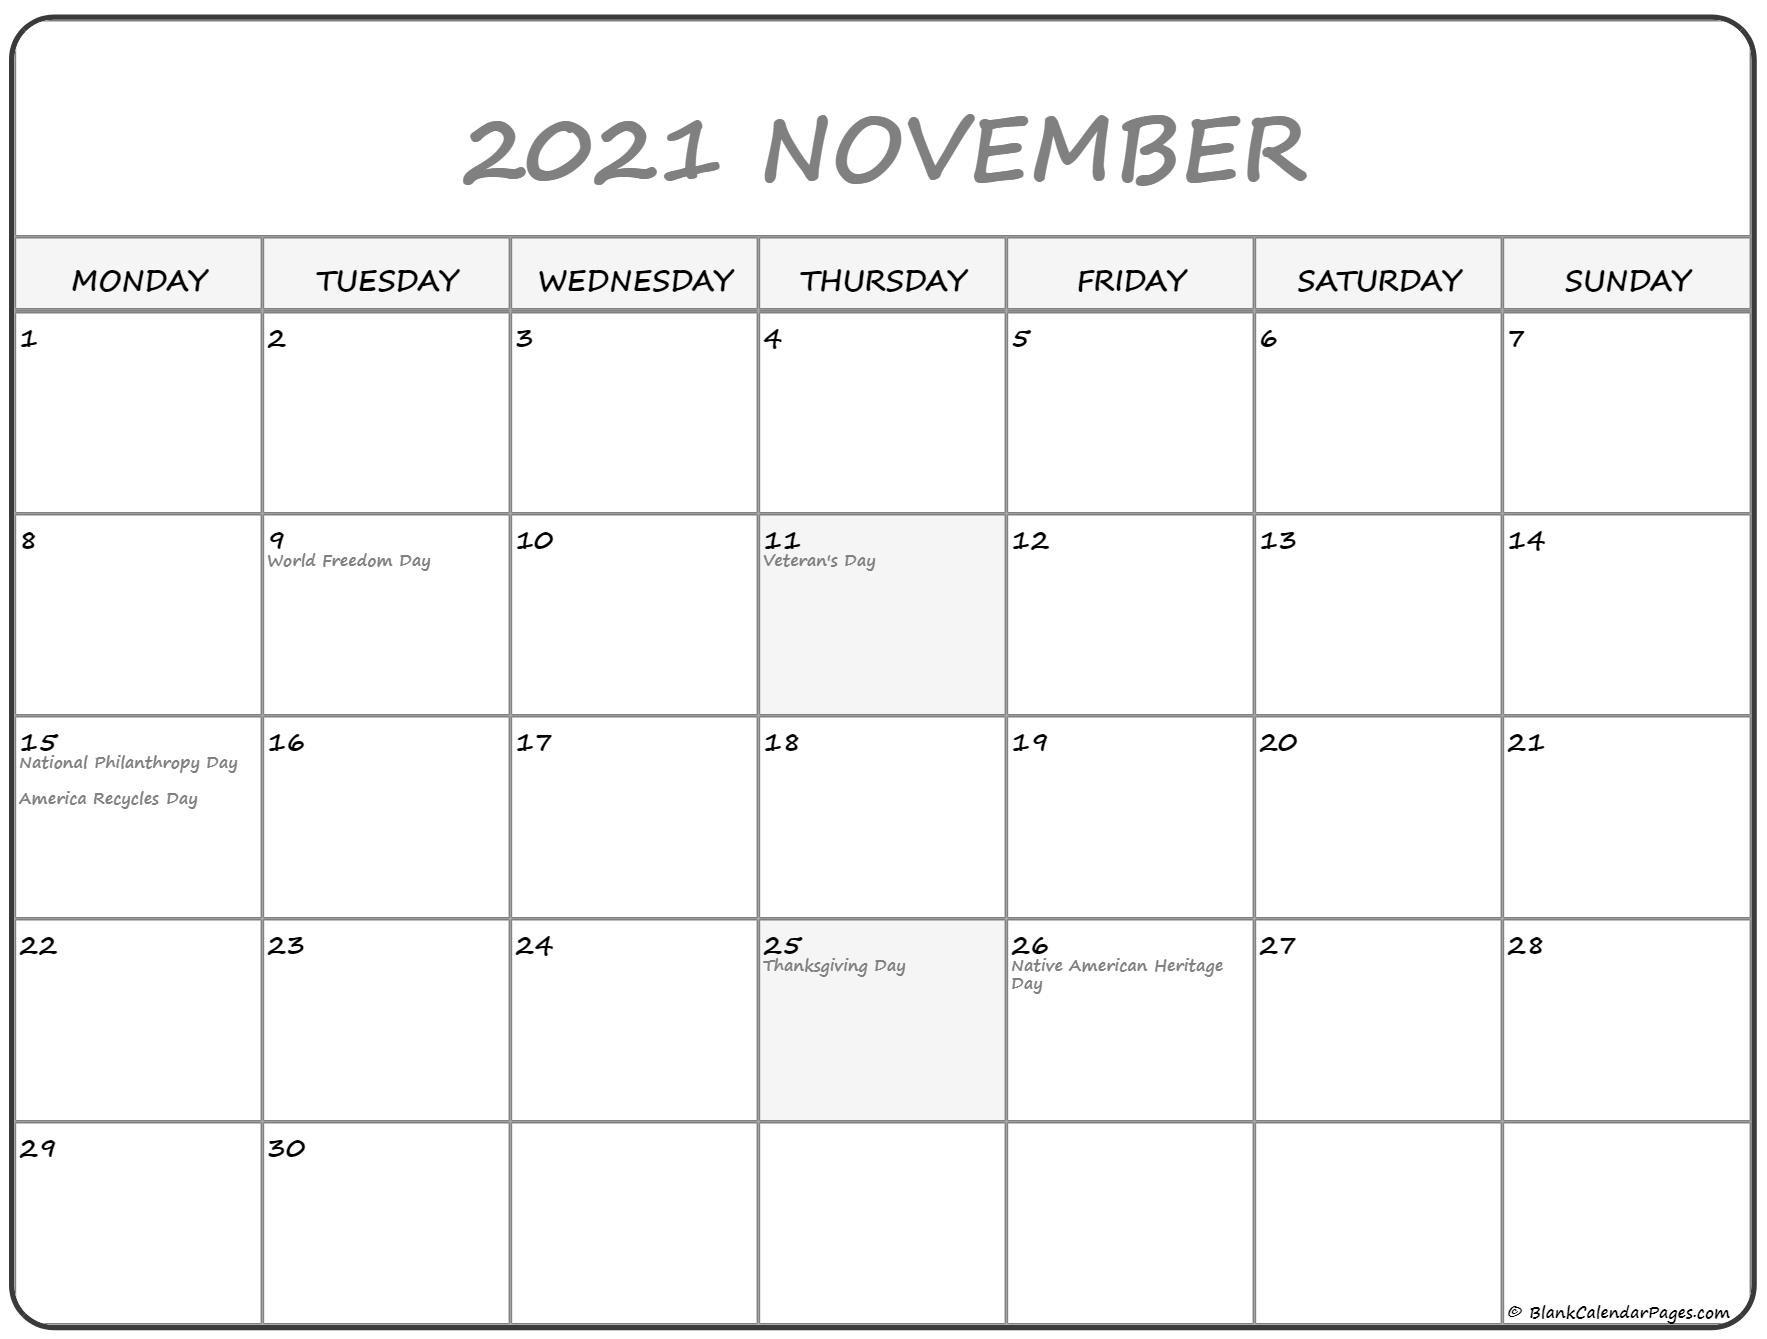 Get Calendar To Fill In 2021